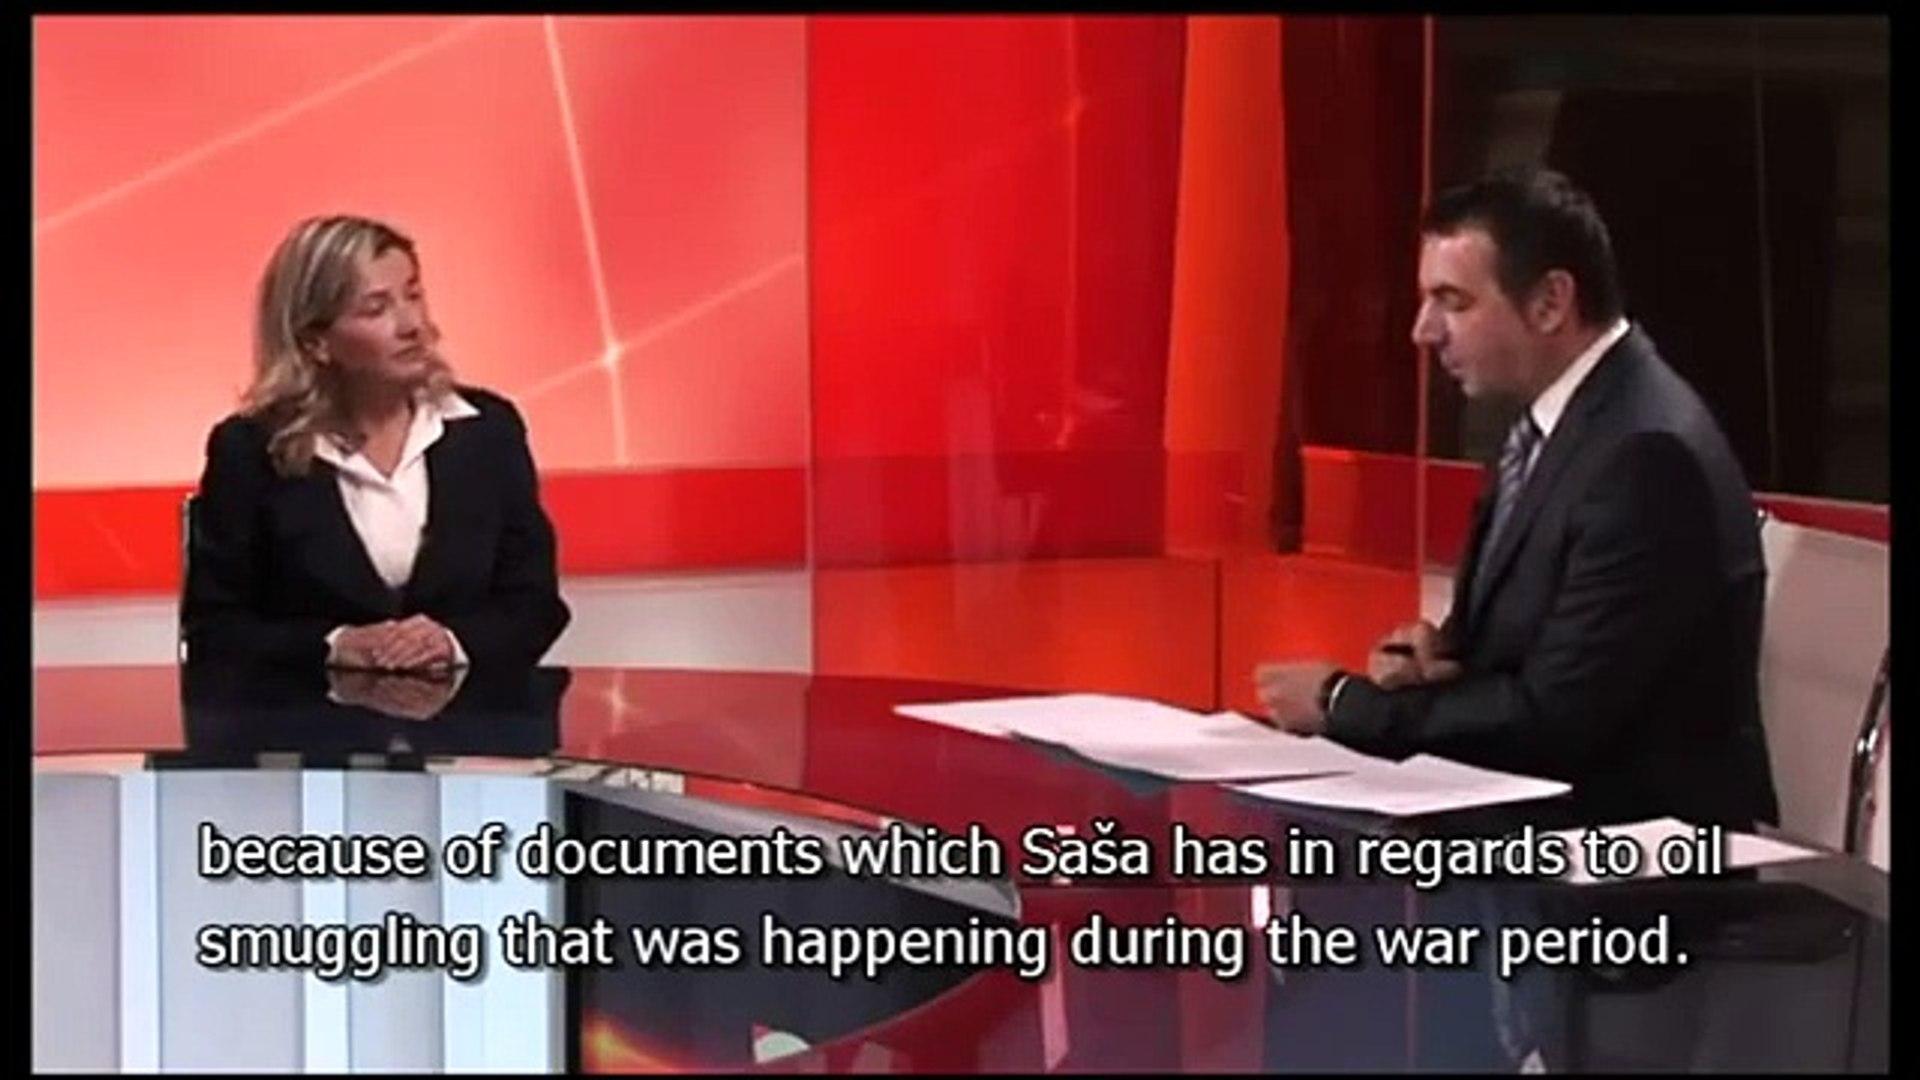 Nataša Srdoč about a political prisoner Saša Radović